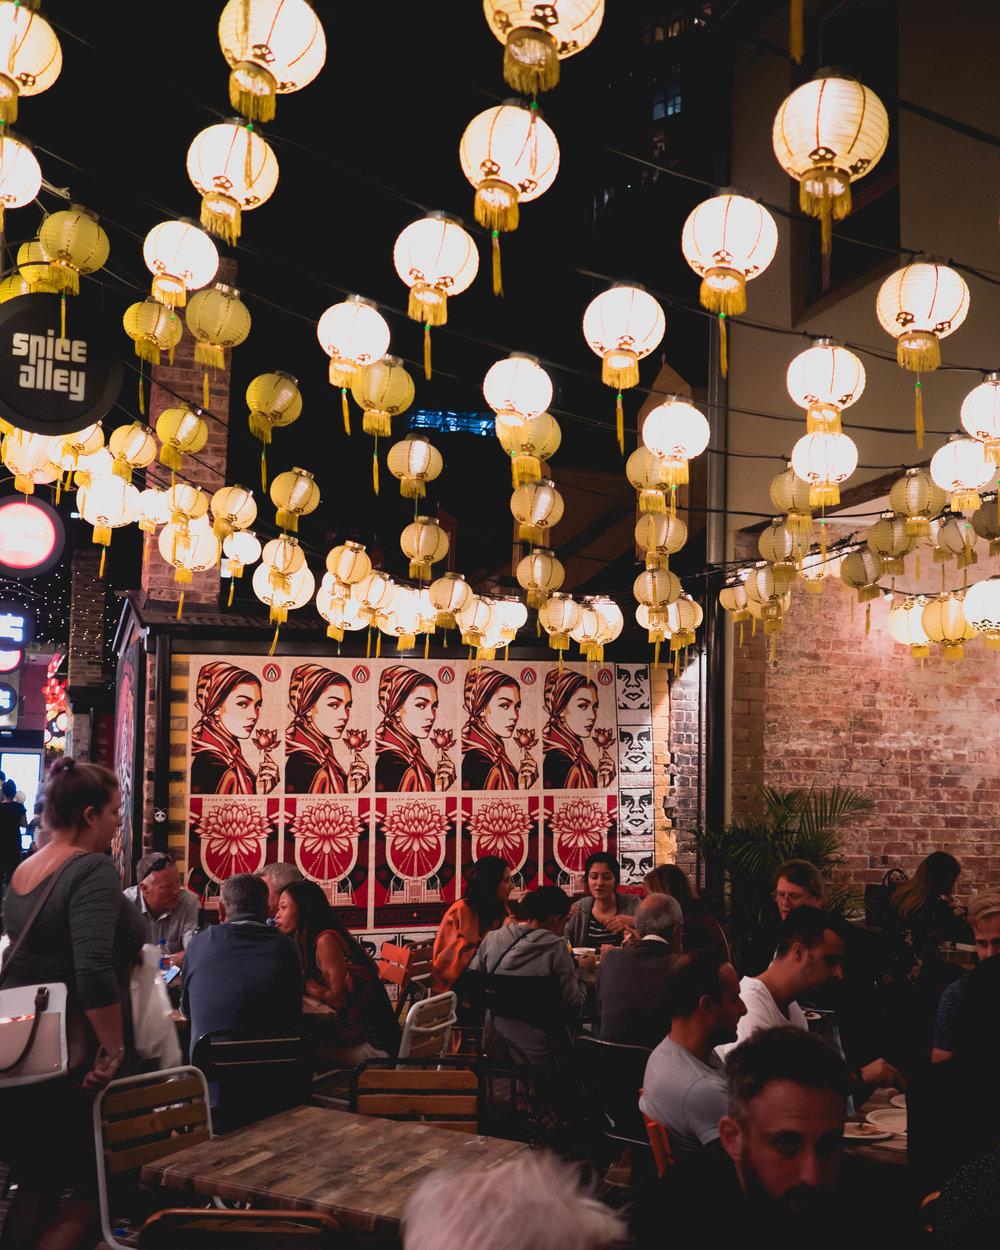 shepherd fairey and chinese lanterns.